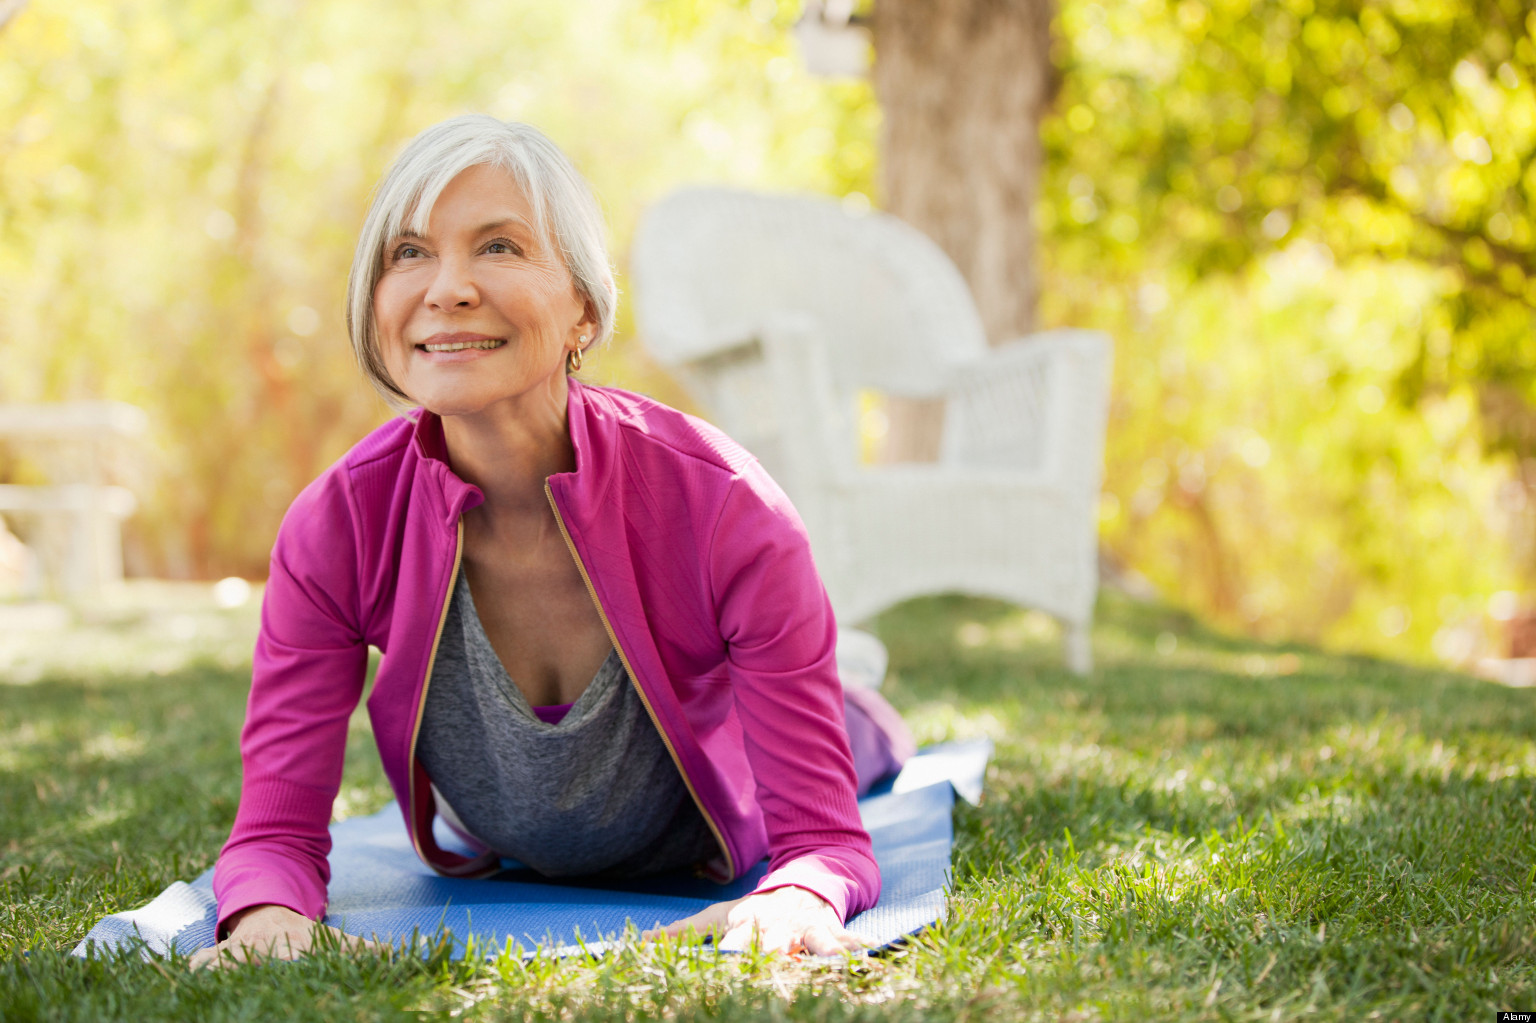 гимнастика кому за 60 лет